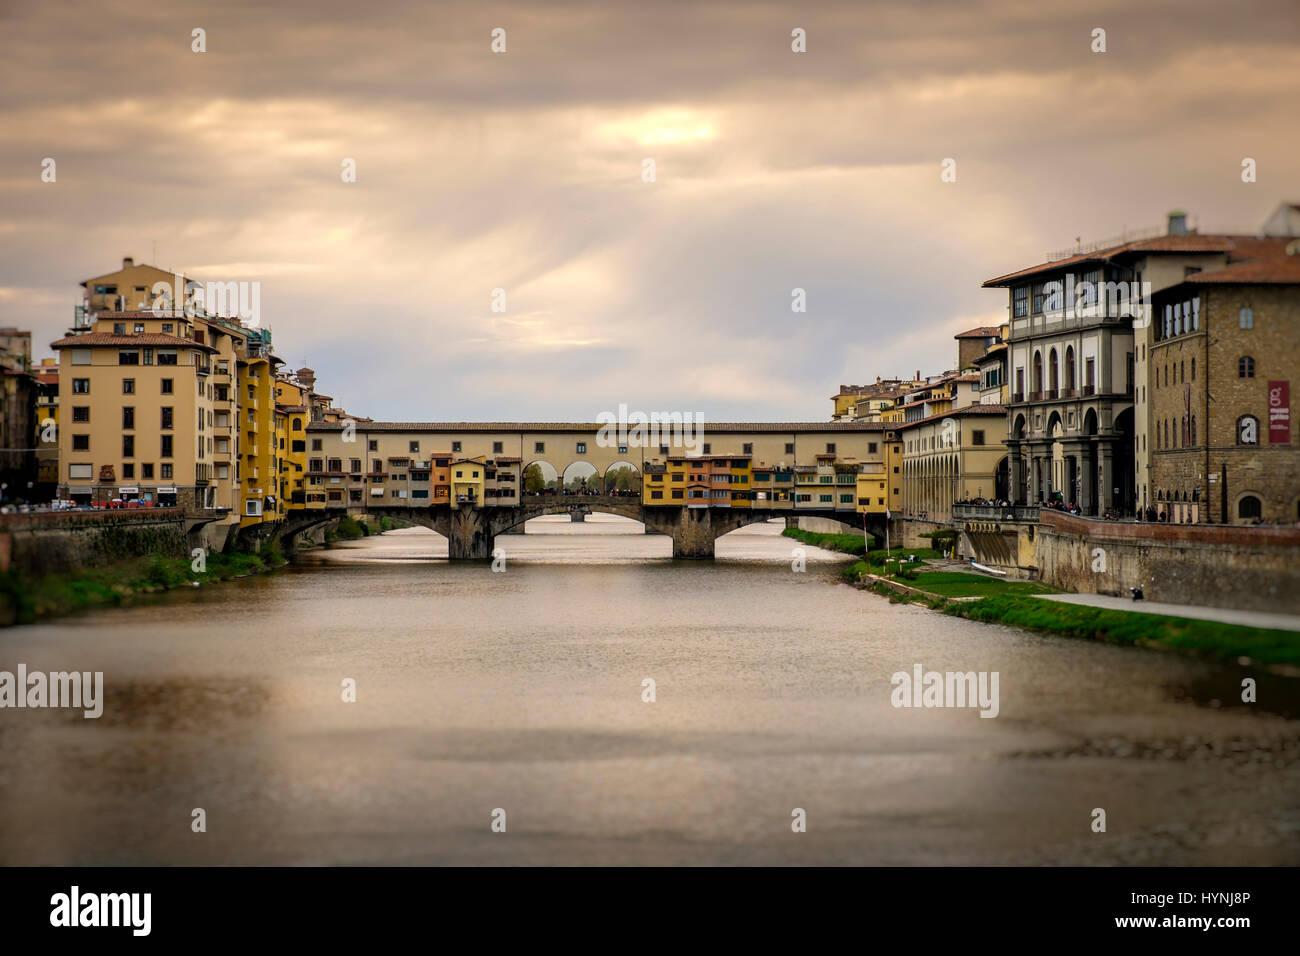 Florenz, Italien - ca. Mai 2015: Ponte Vecchio und Arno Fluss in Florenz, Italien. Stockbild